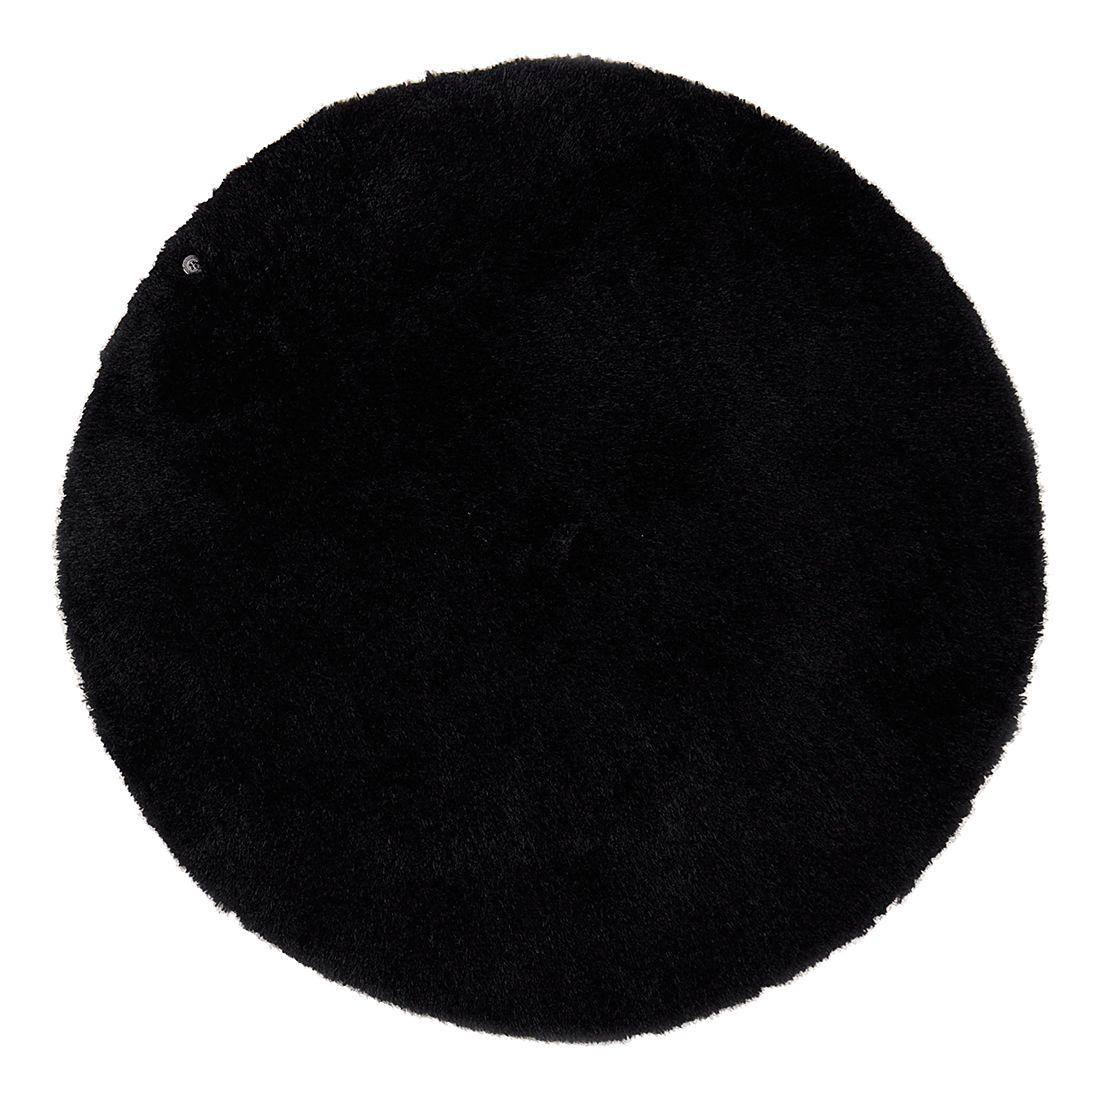 Image of Tappeto Soft Round - Nero - Dimensioni: 140 x 140 cm, Tom Tailor